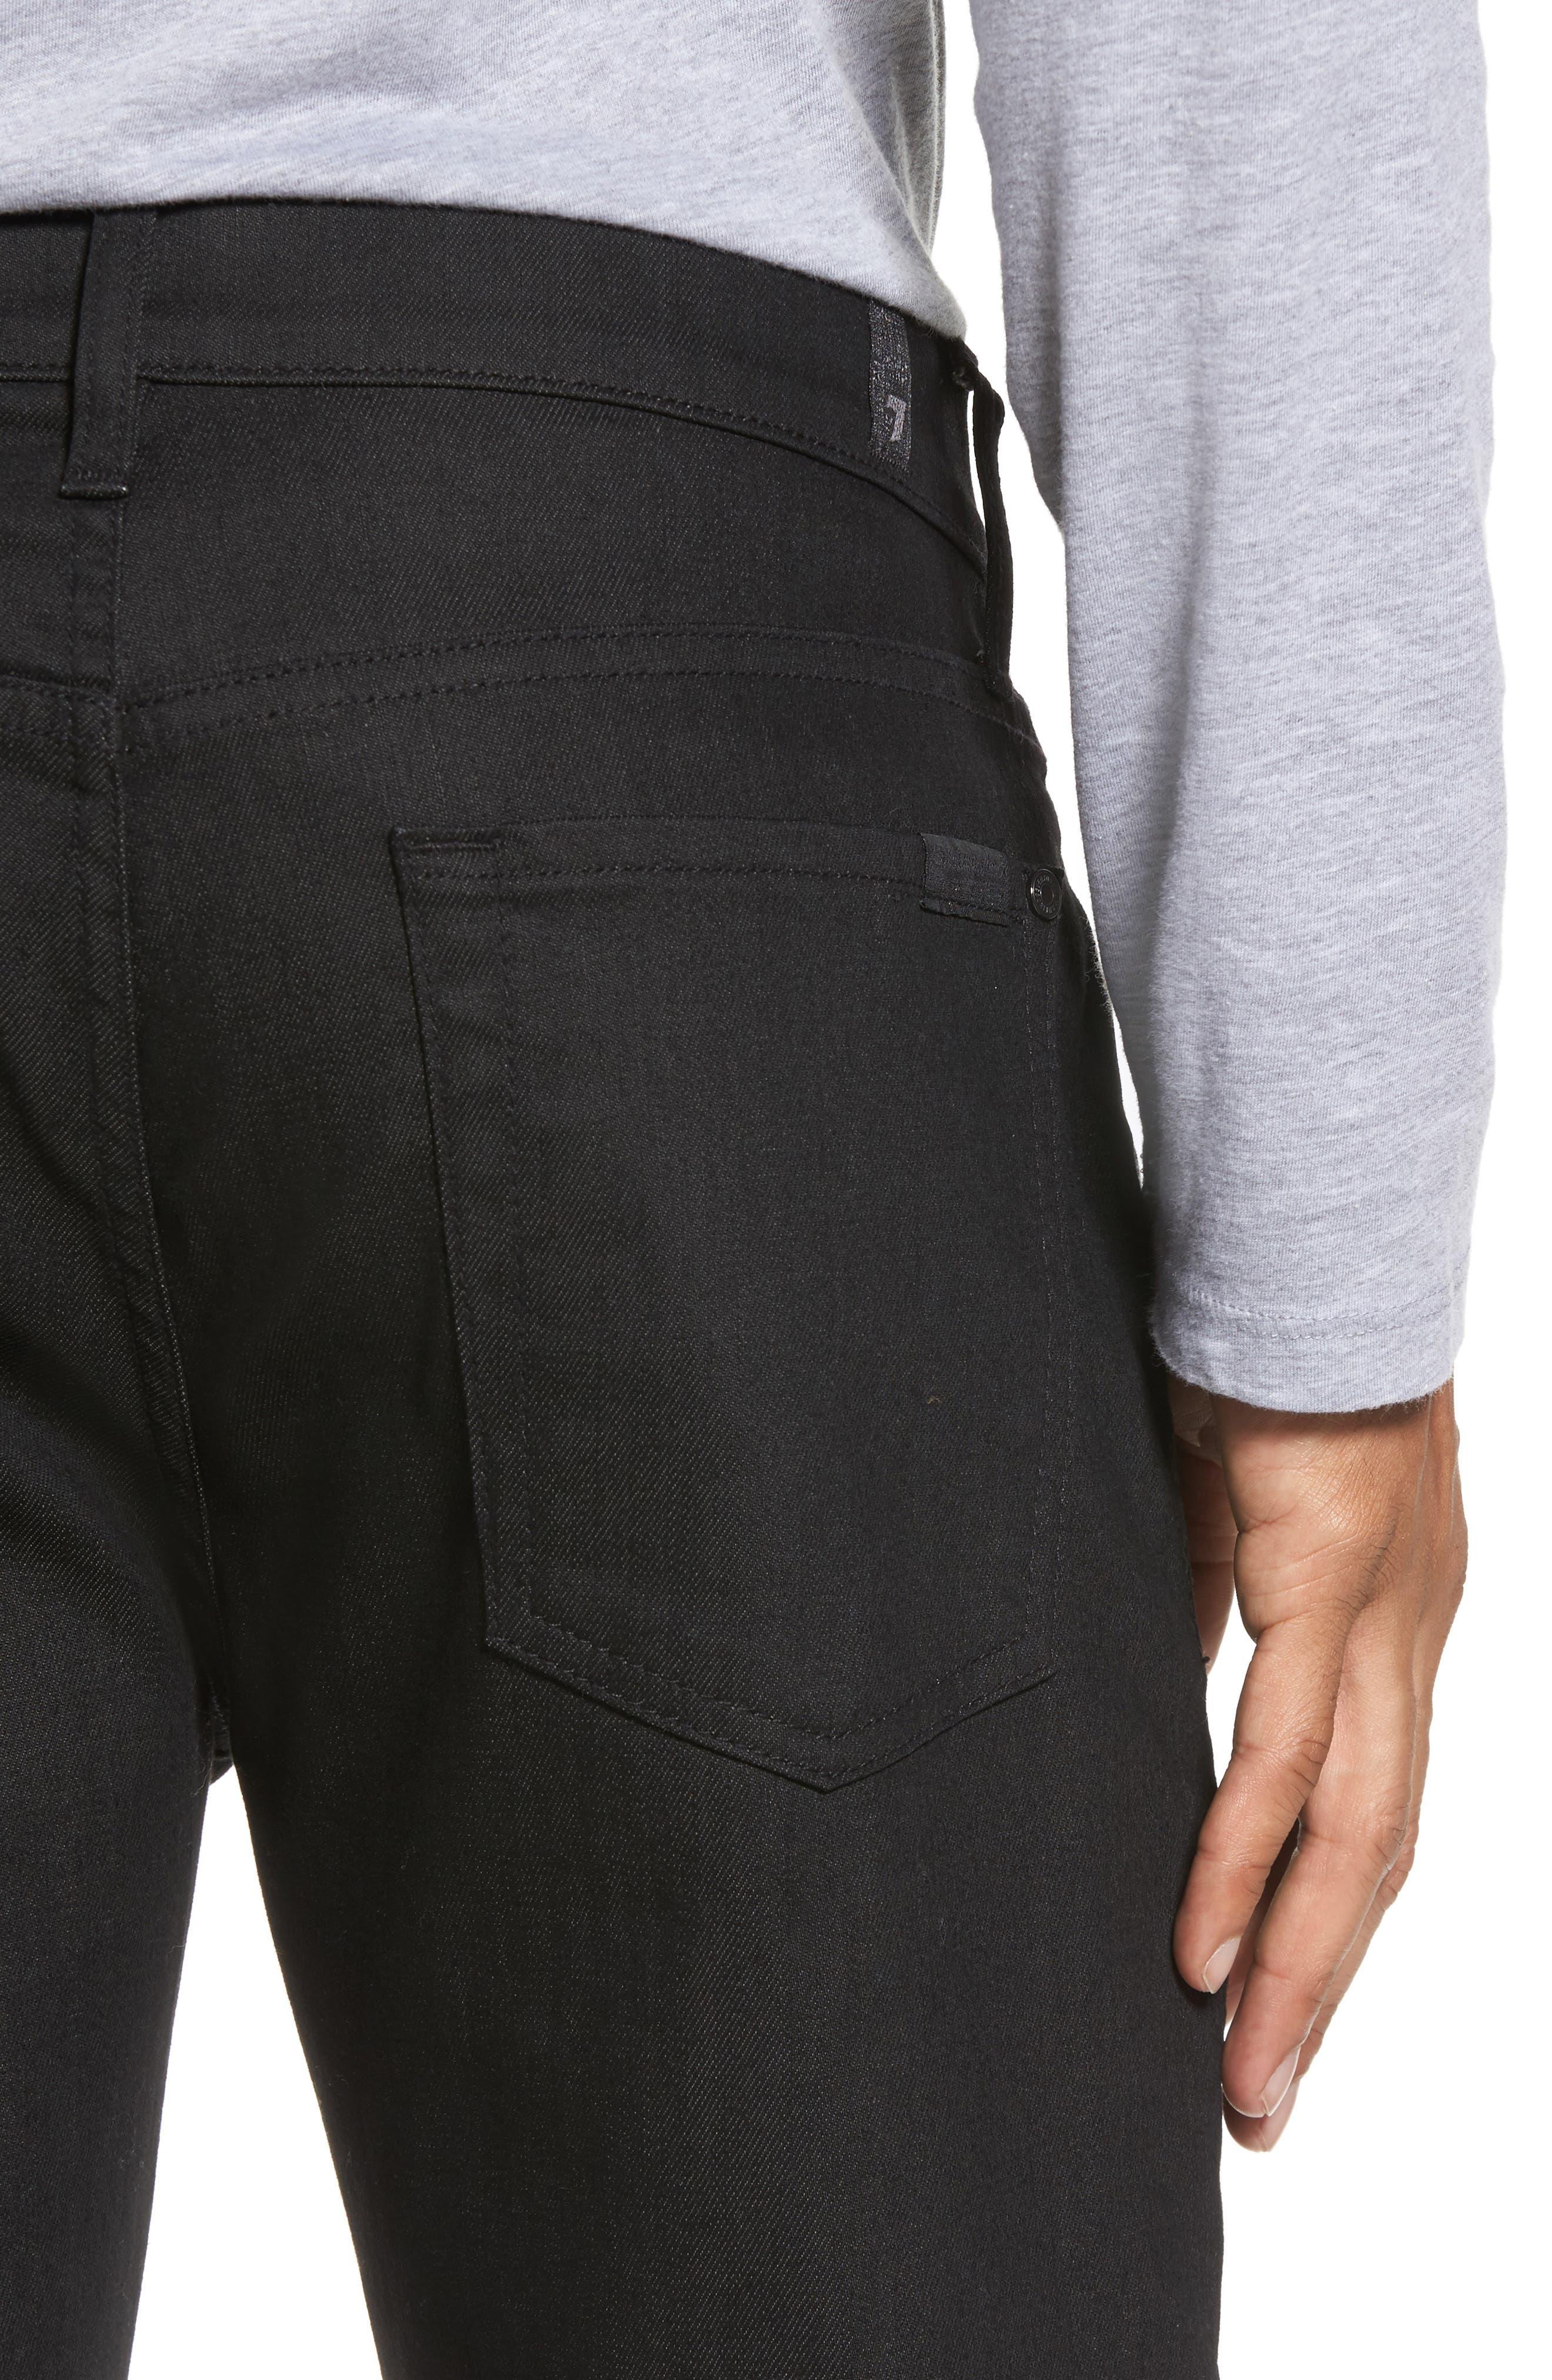 Airweft - Slimmy Slim Fit Jeans,                             Alternate thumbnail 4, color,                             004